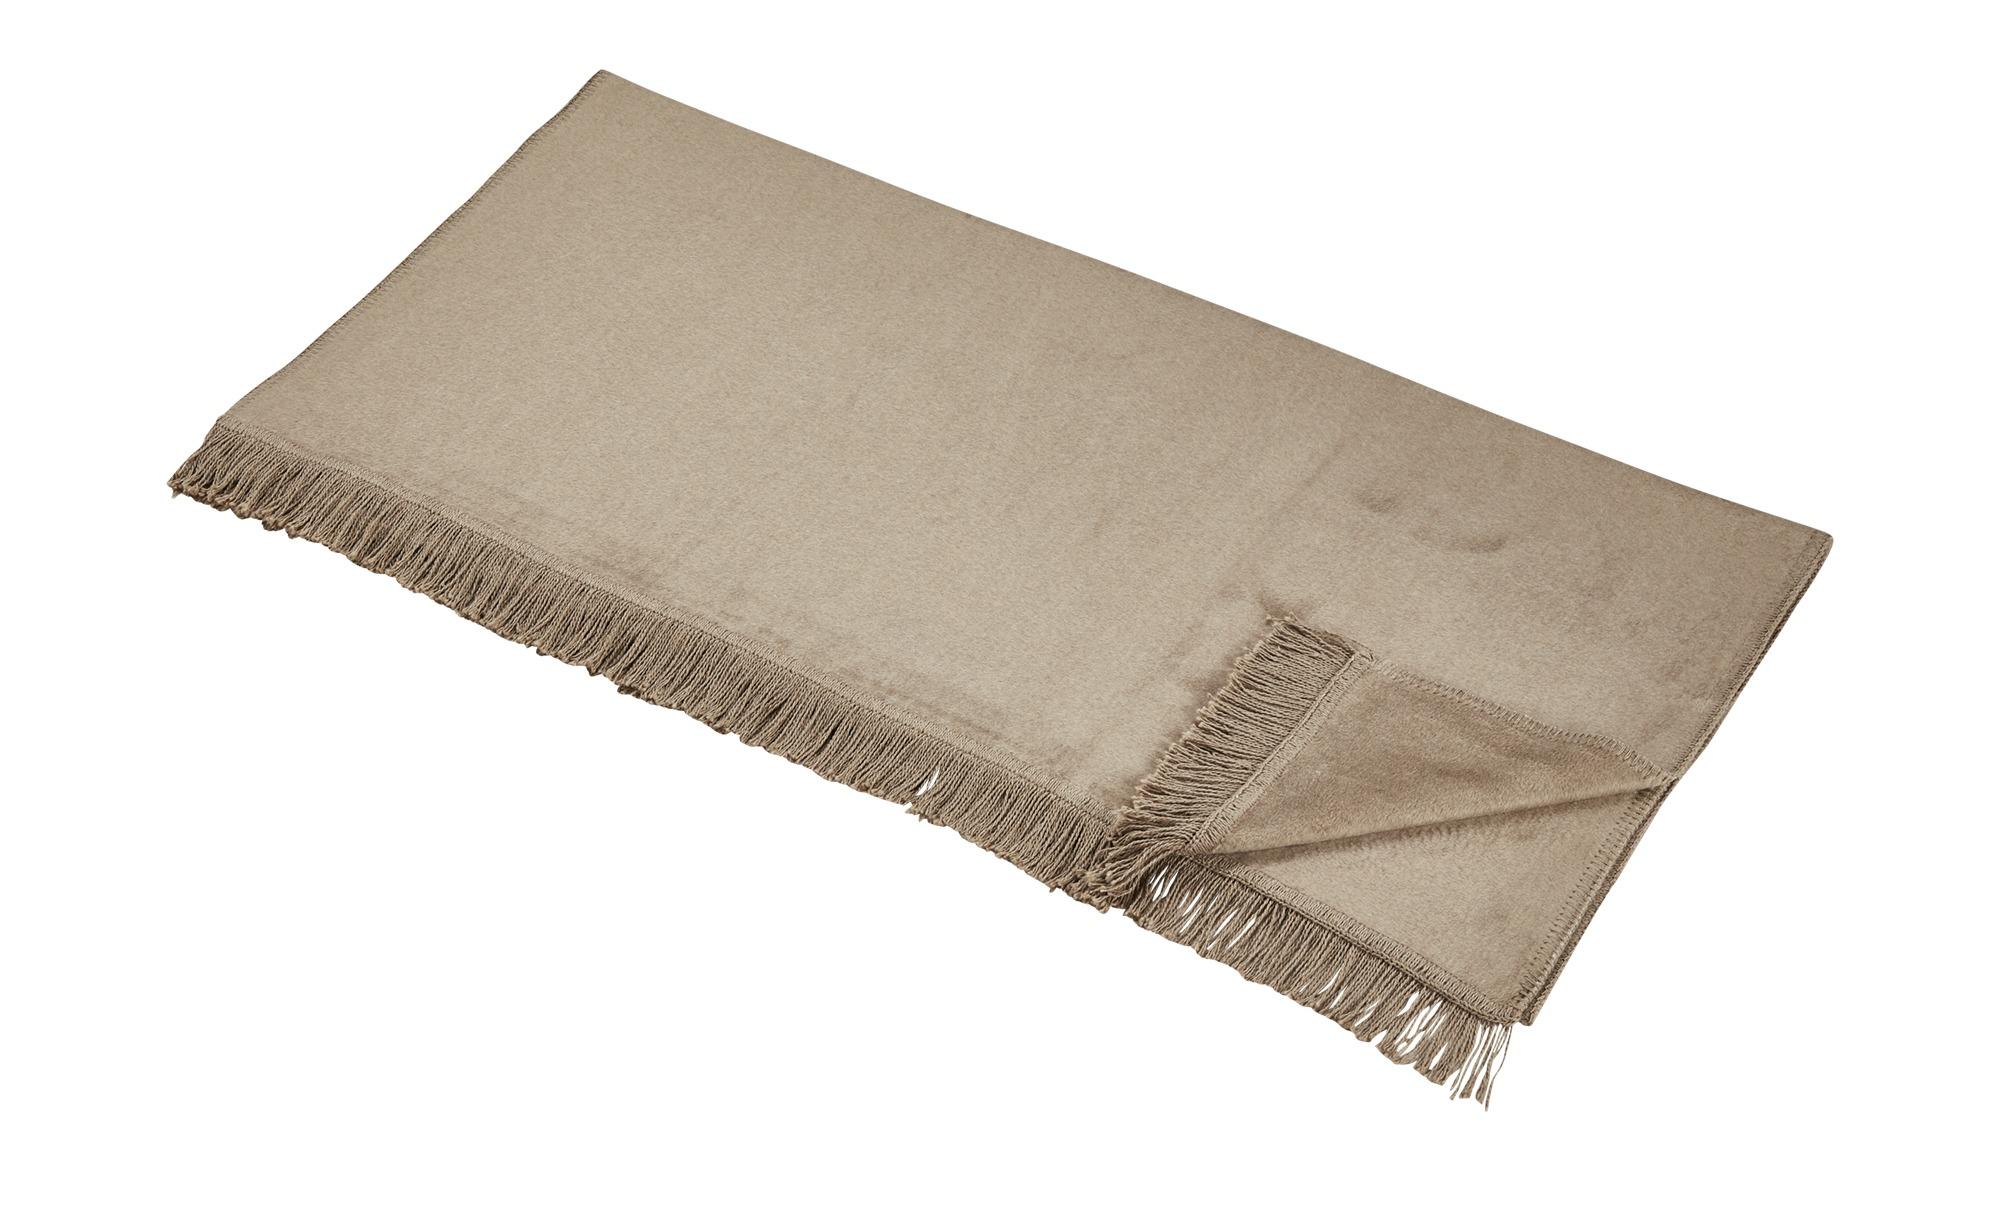 cce580c518 LAVIDA Sofaläufer Uni - braun - 60% Baumwolle, 40% Polyacryl - 100 cm -  Bettwaren > Tagesdecken & Bettüberwürfe - Möbel Kraft